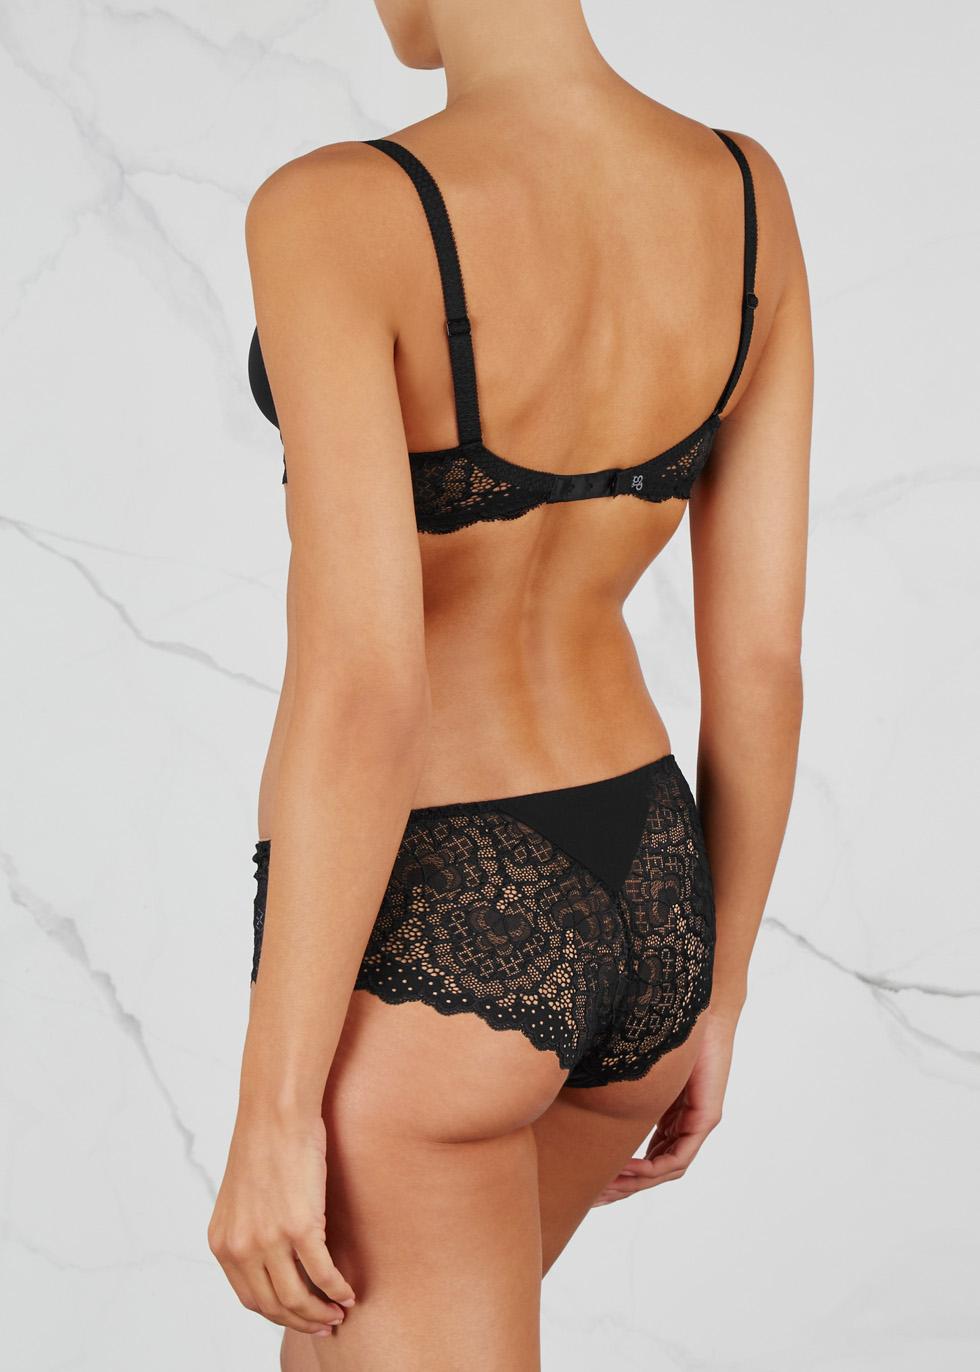 Caresse 3D black underwired bra - Simone Pérèle